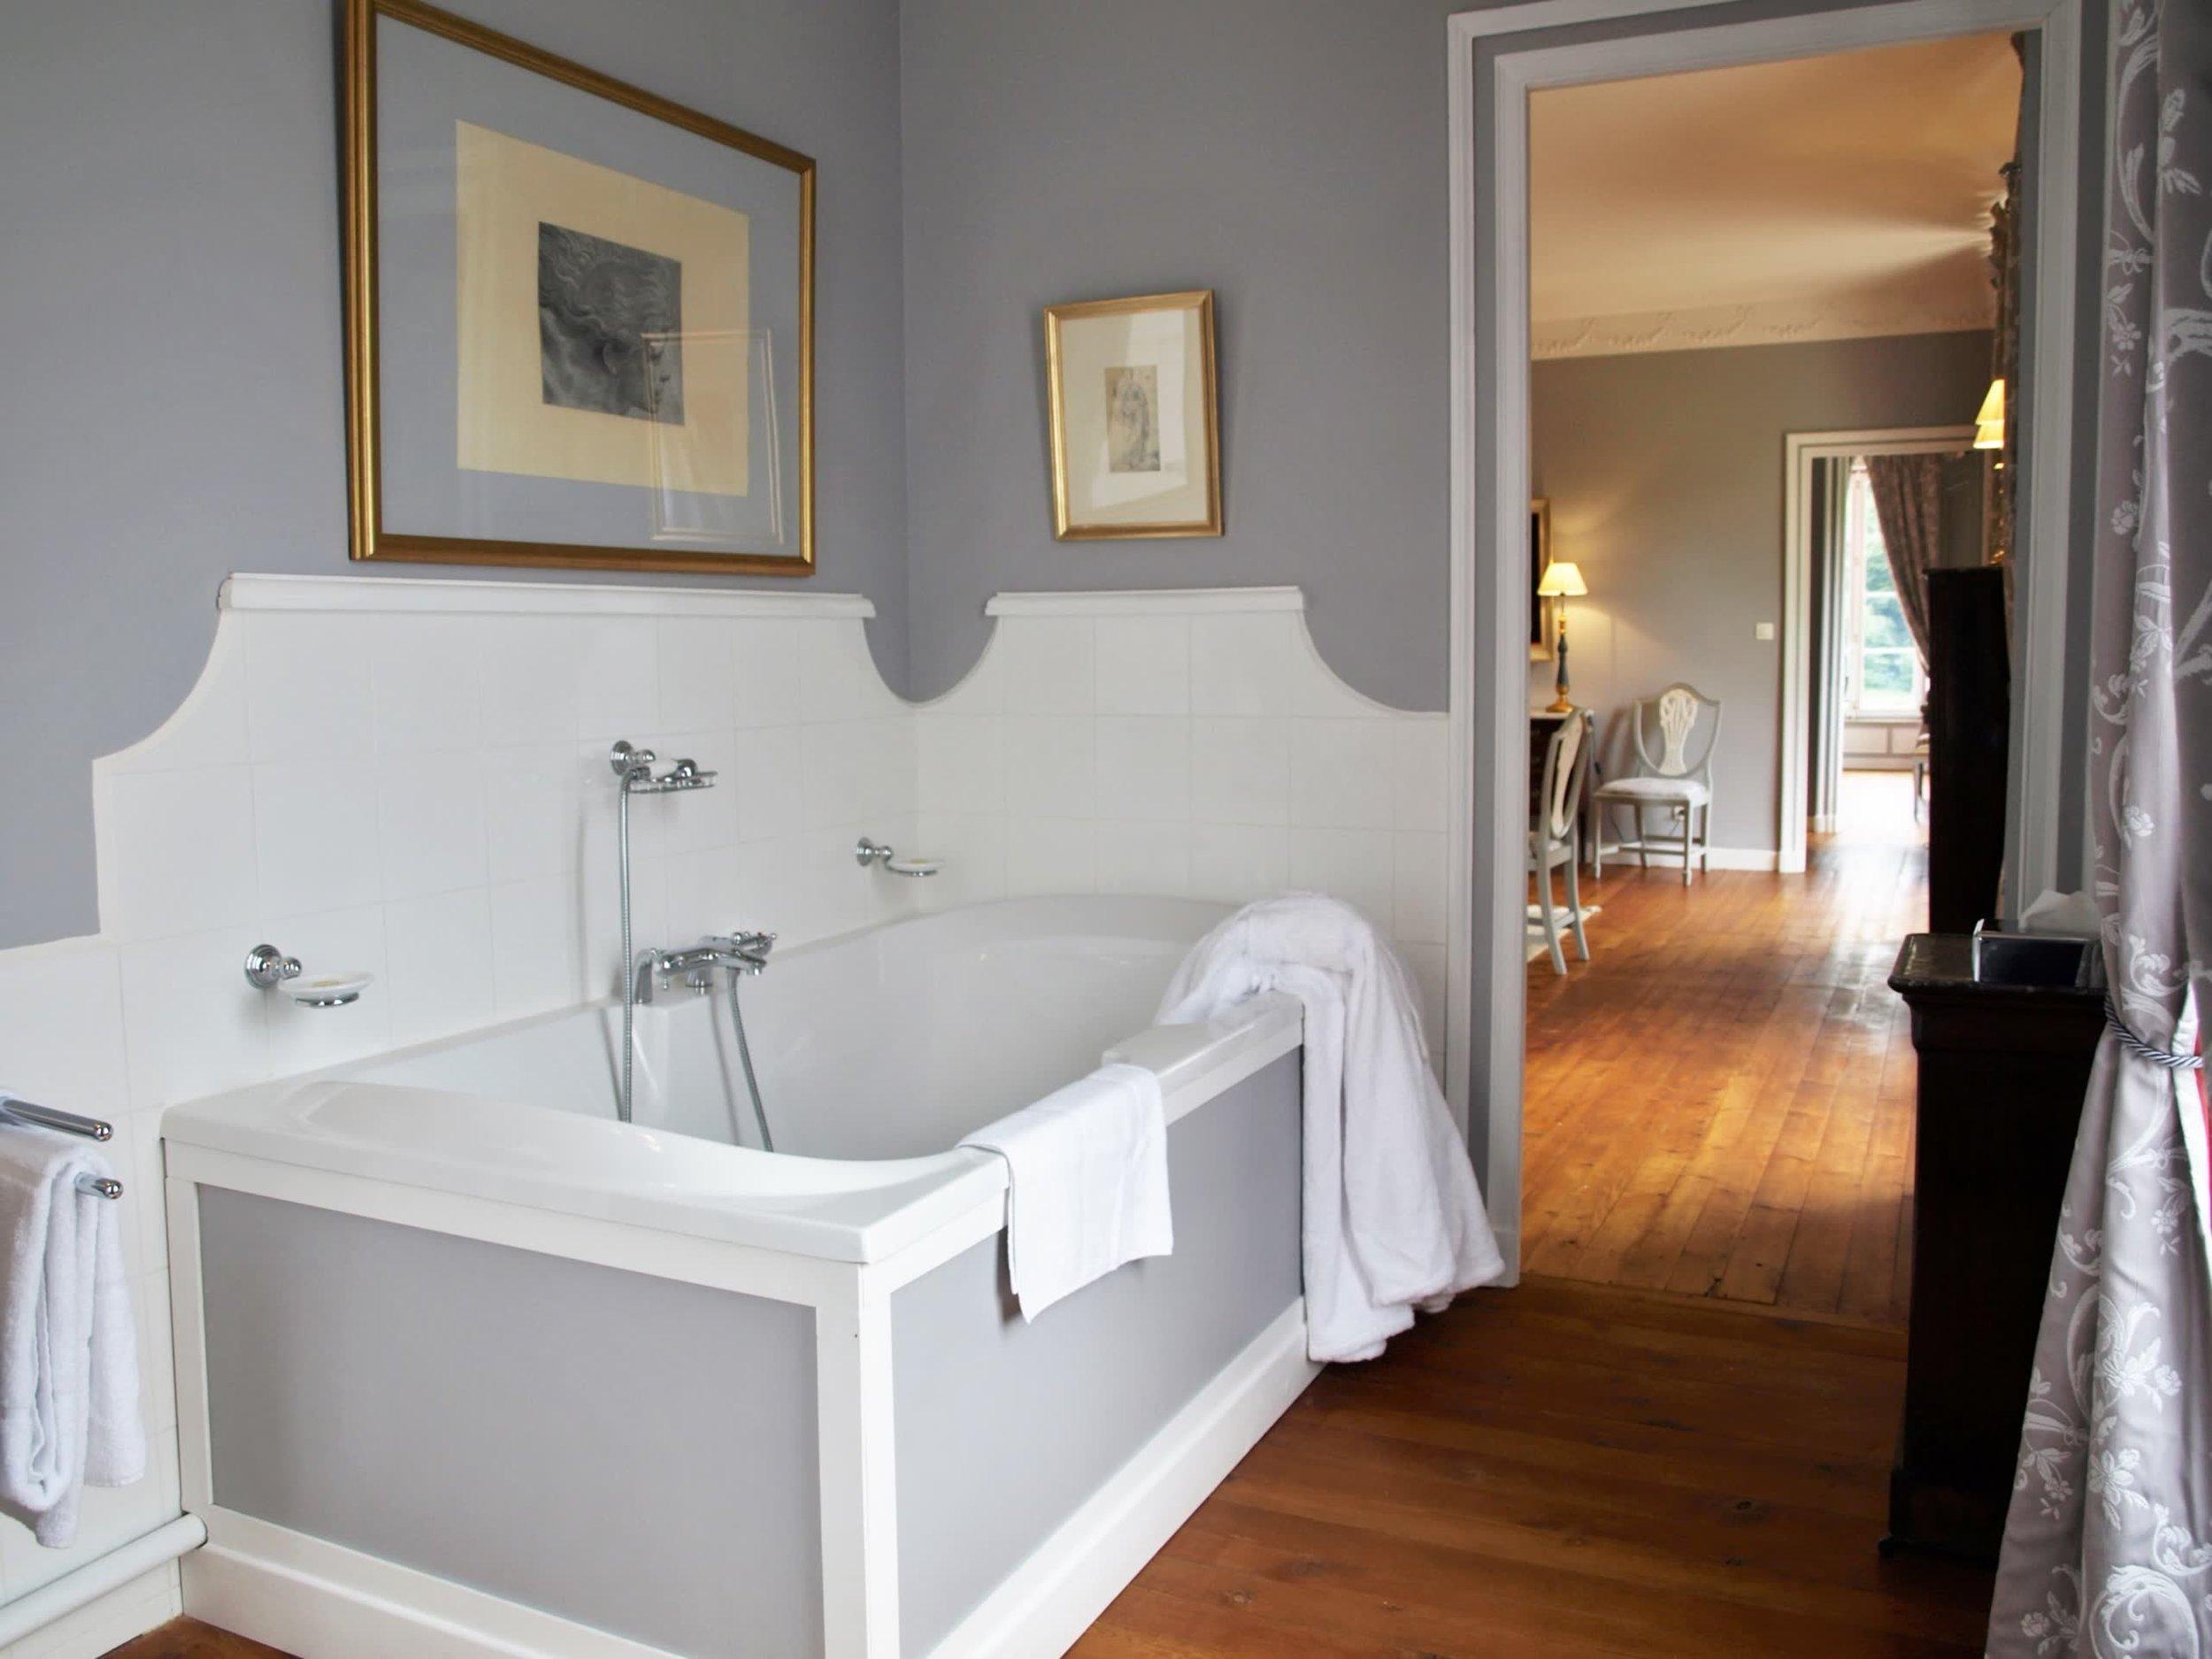 Chateau de la Pommeraye - charming boutique hotel chateau b&b spa normandy calvados bedroom Rubans 8(2).jpg